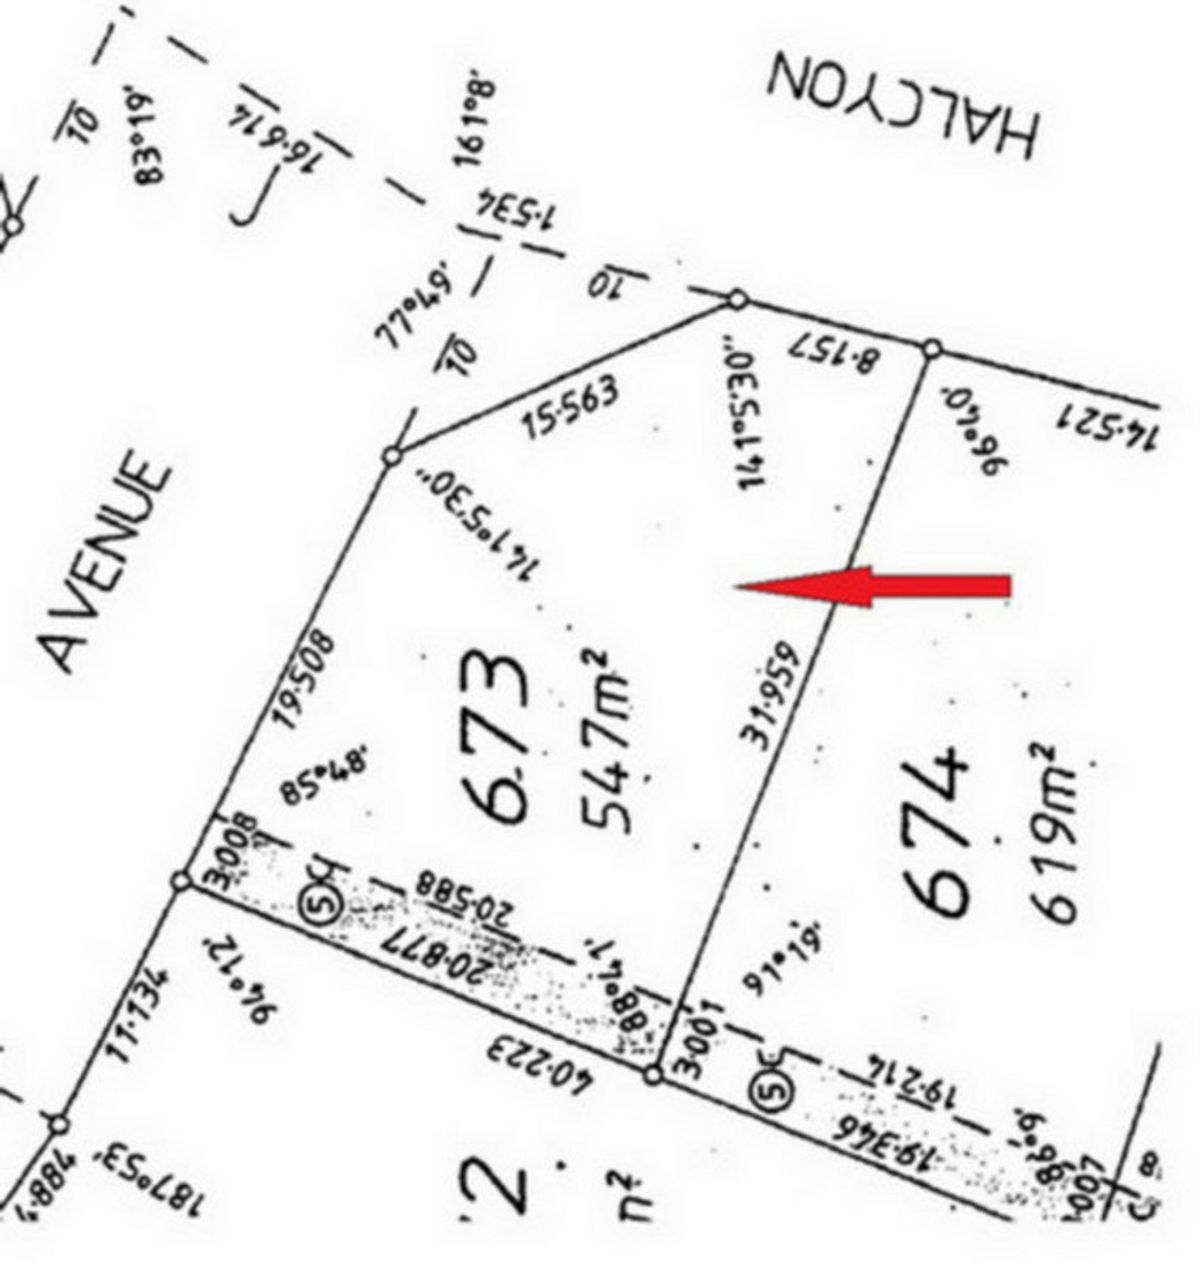 32 Halcyon Crescent, Margaret River, WA 6285